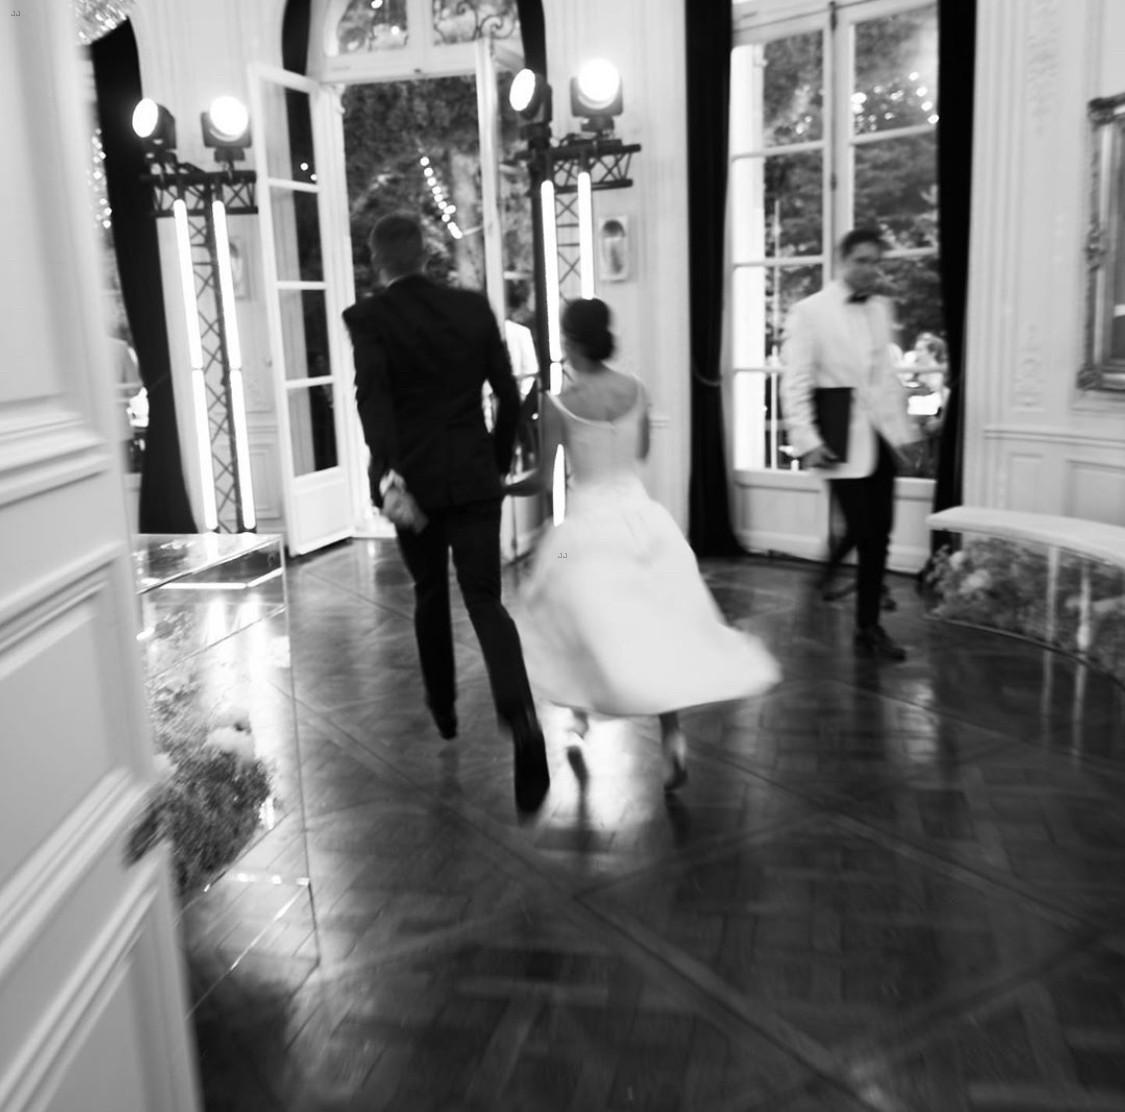 Zoe Kravitz Vs Amber Heard: Zoe Kravitz Shares Photos From Her Paris Wedding To Karl